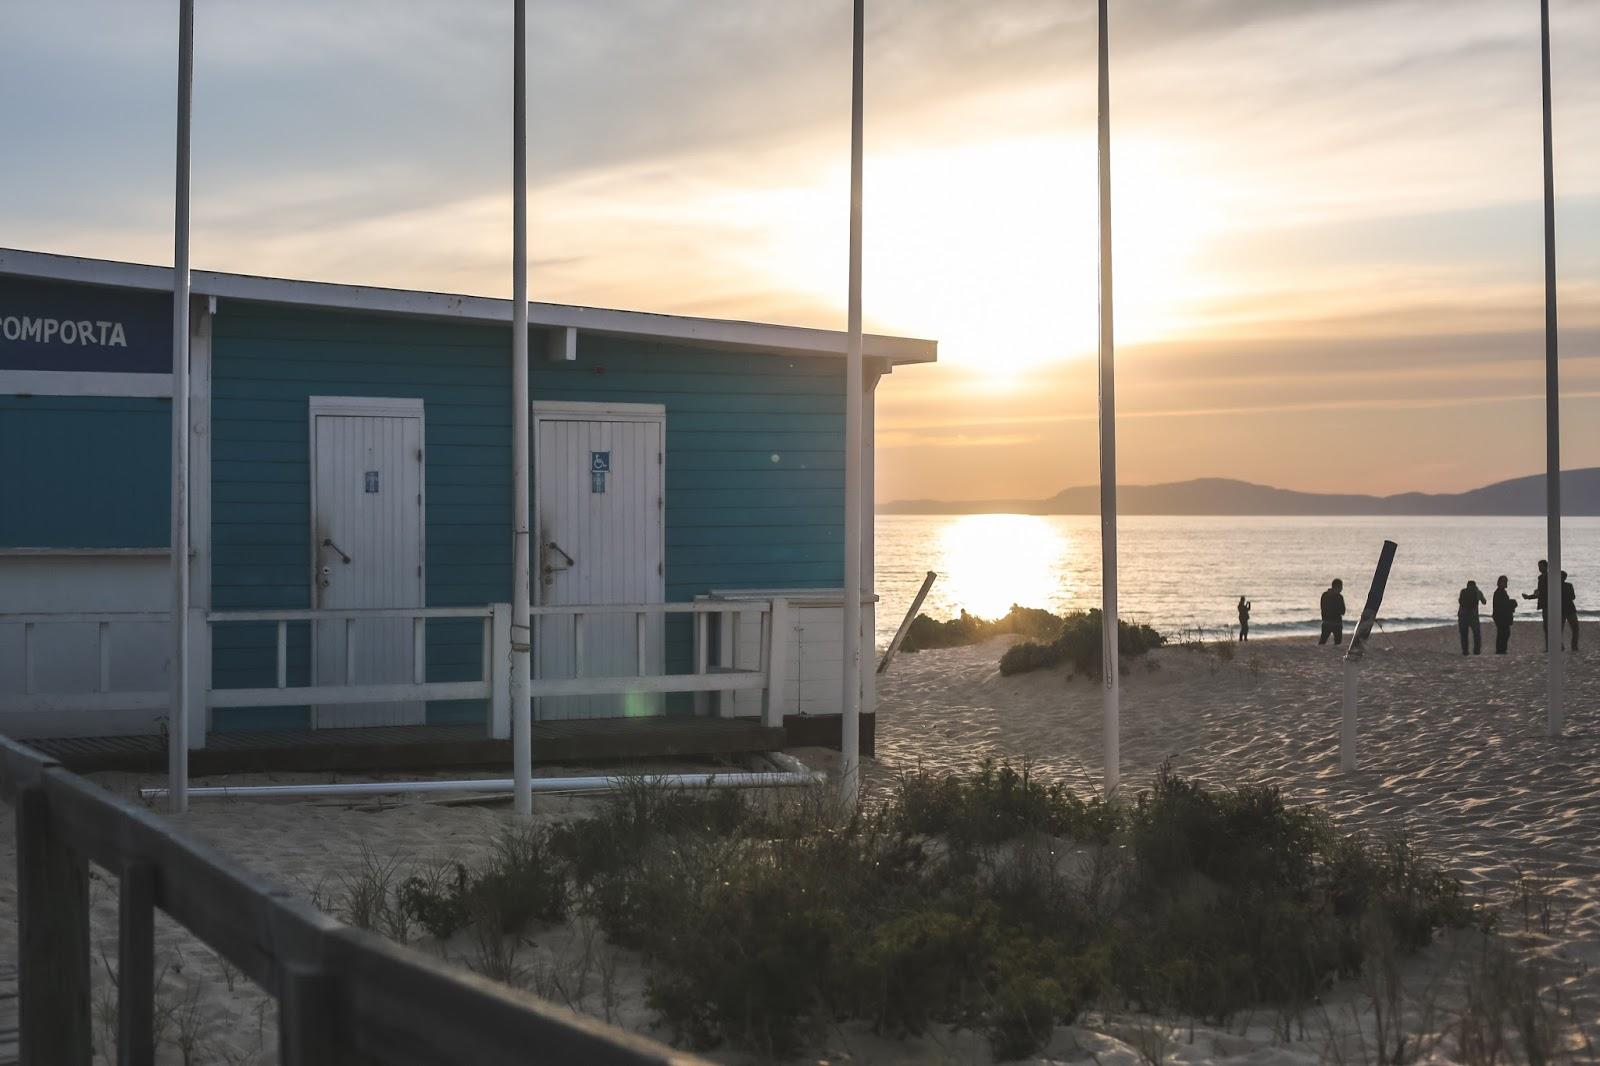 comporta portugal venus is naive blog voyage